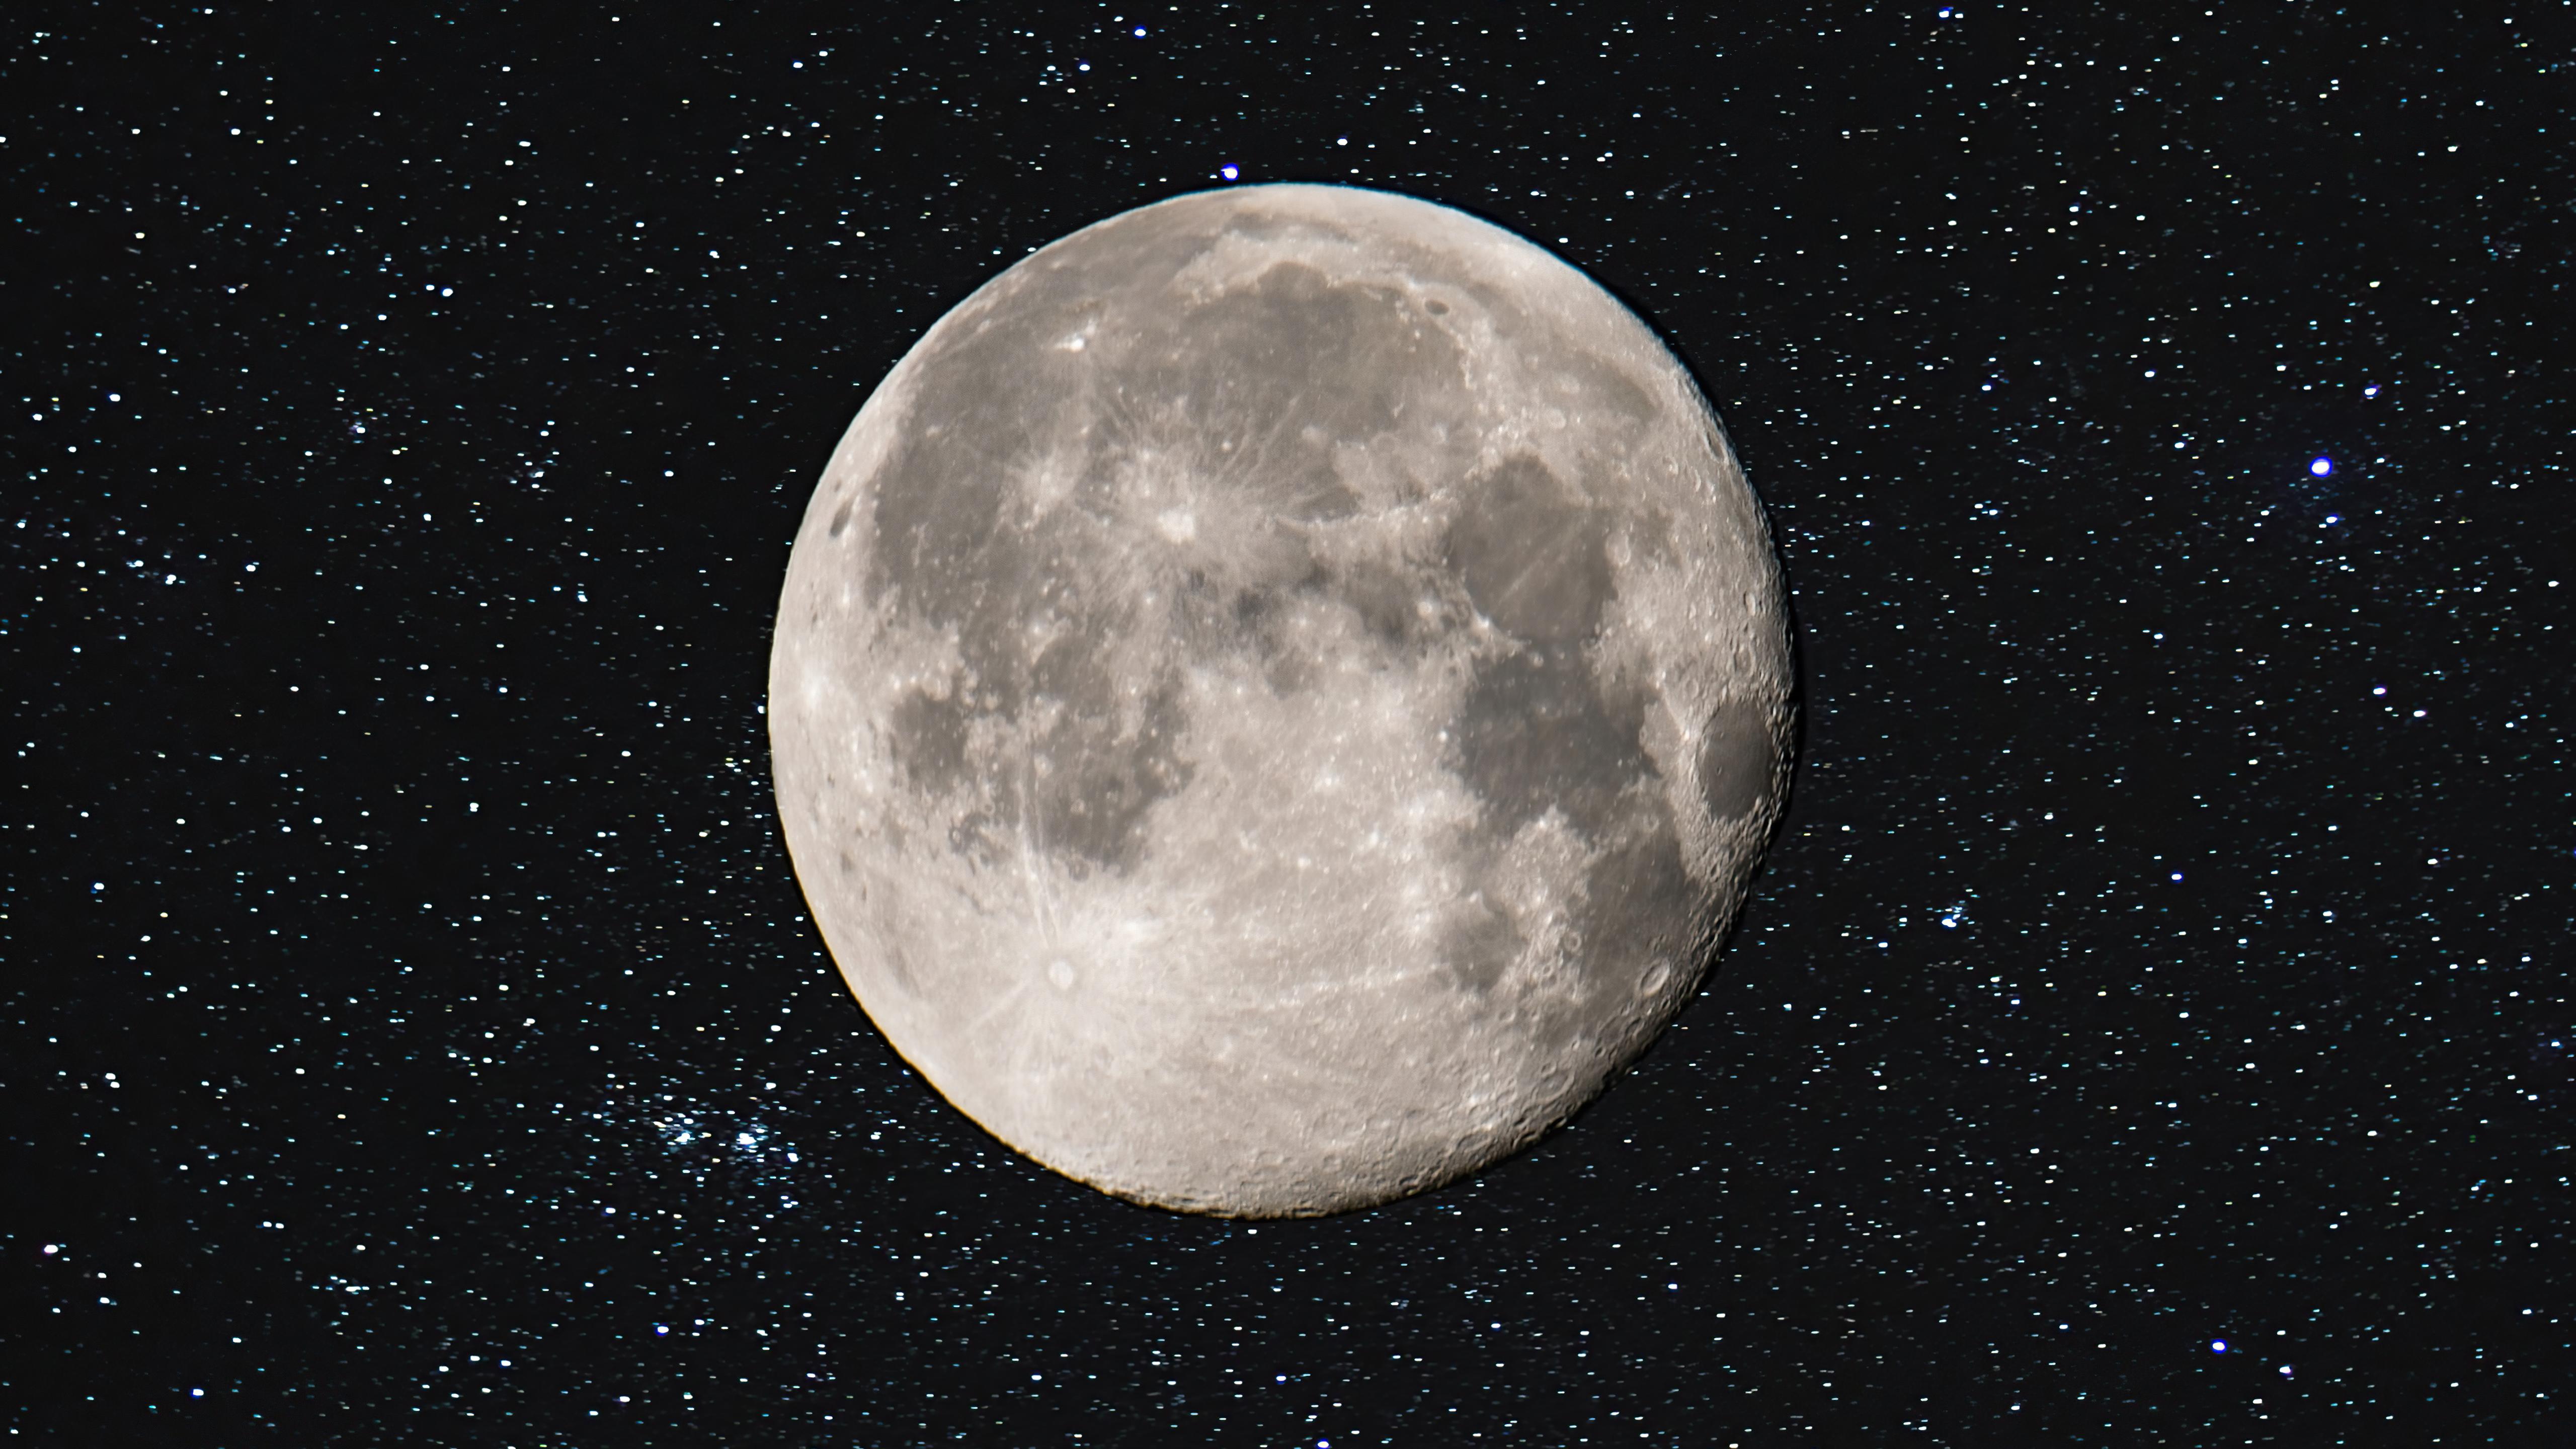 moon space 4k 1629256144 - Moon Space 4k - Moon Space wallpapers, Moon Space 4k wallpapers